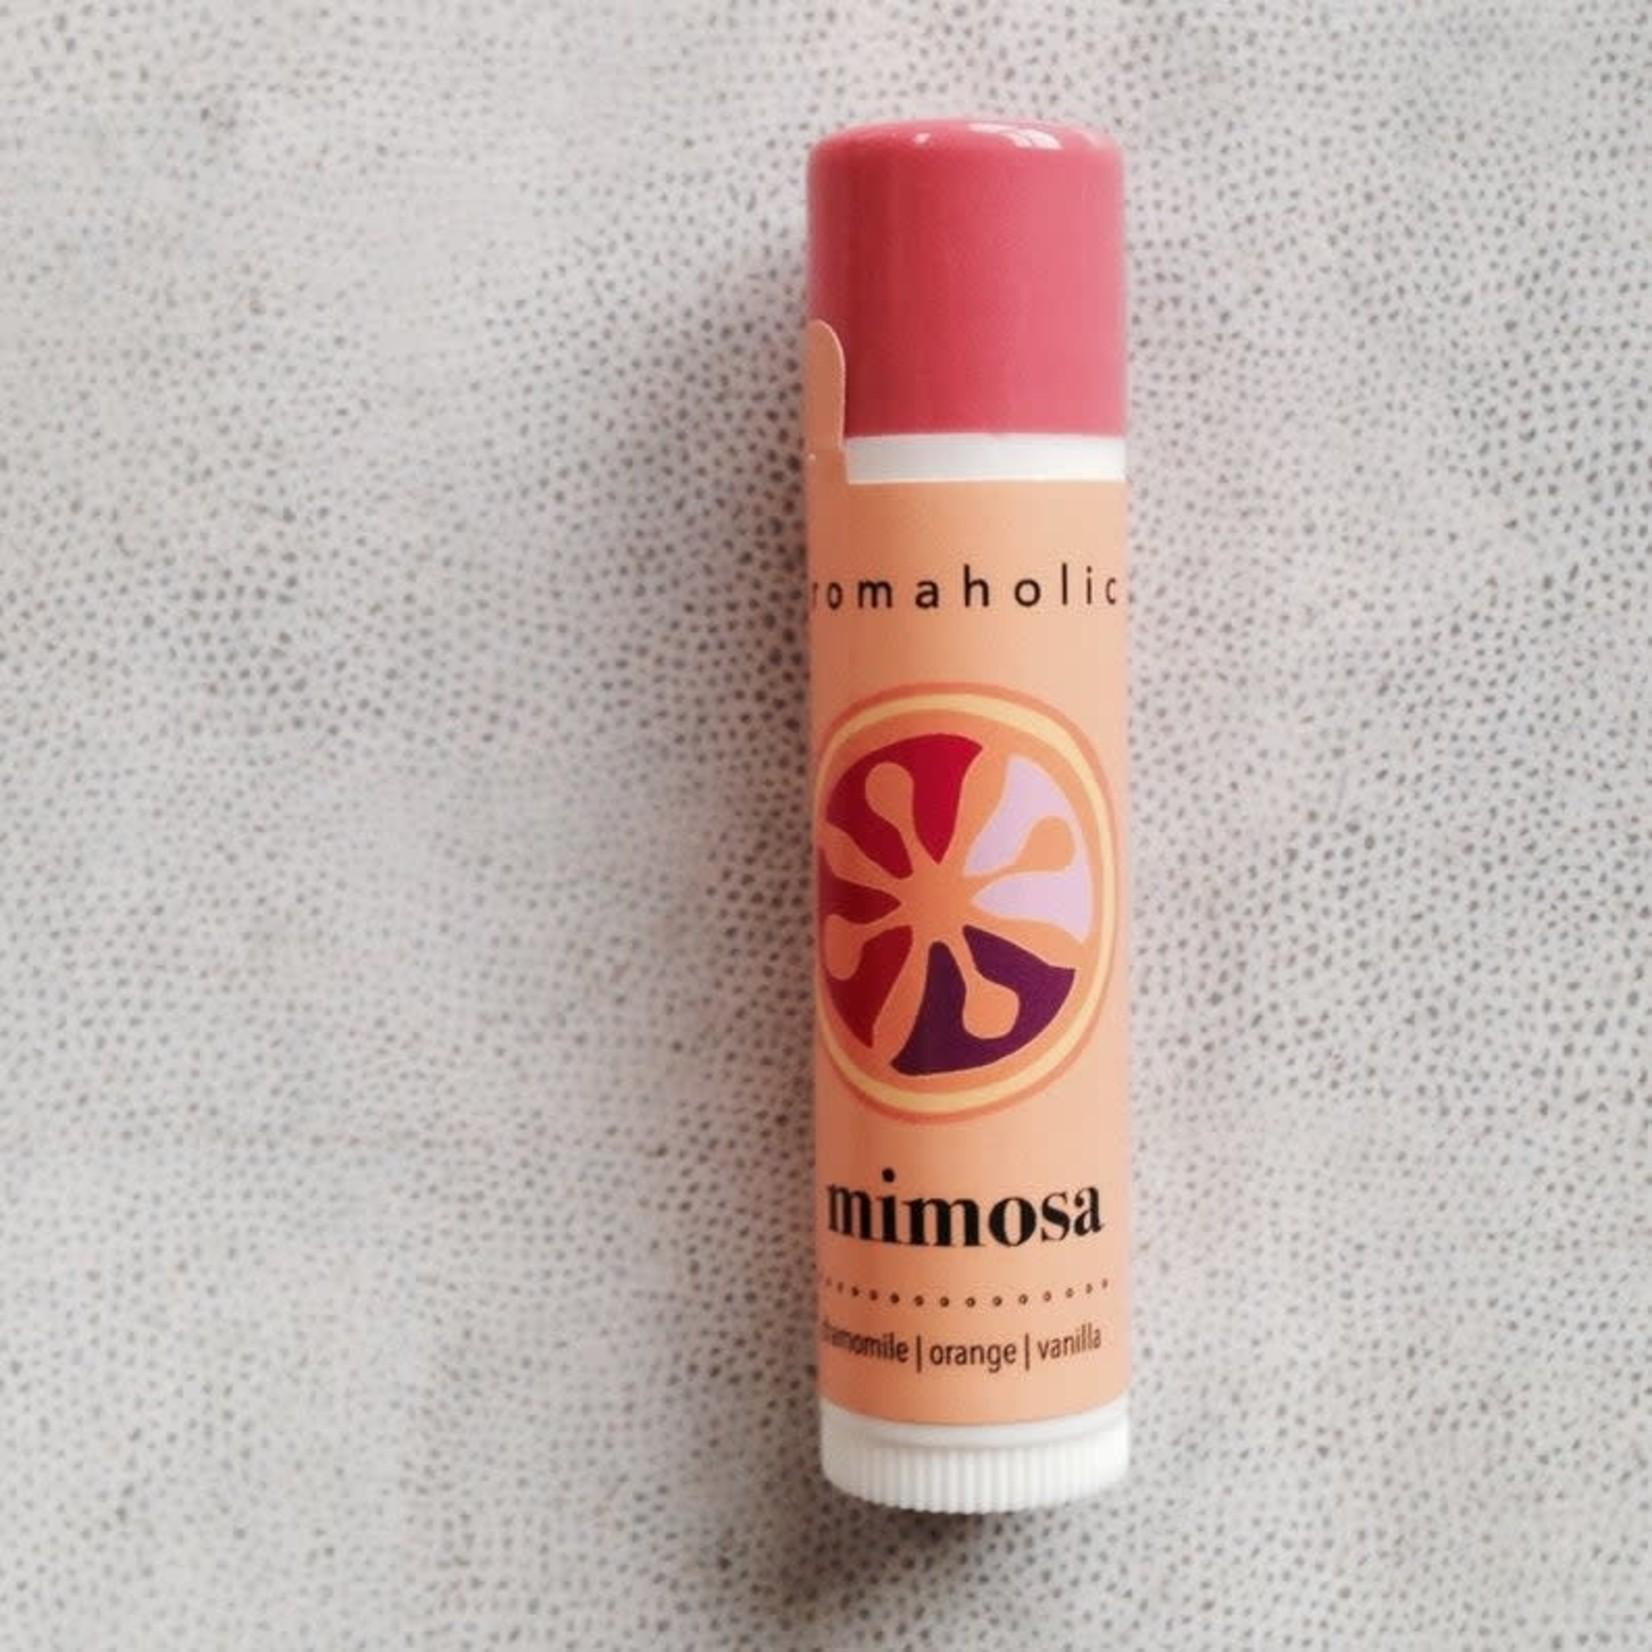 Aromaholic Mimosa Cocktail Lip Balm